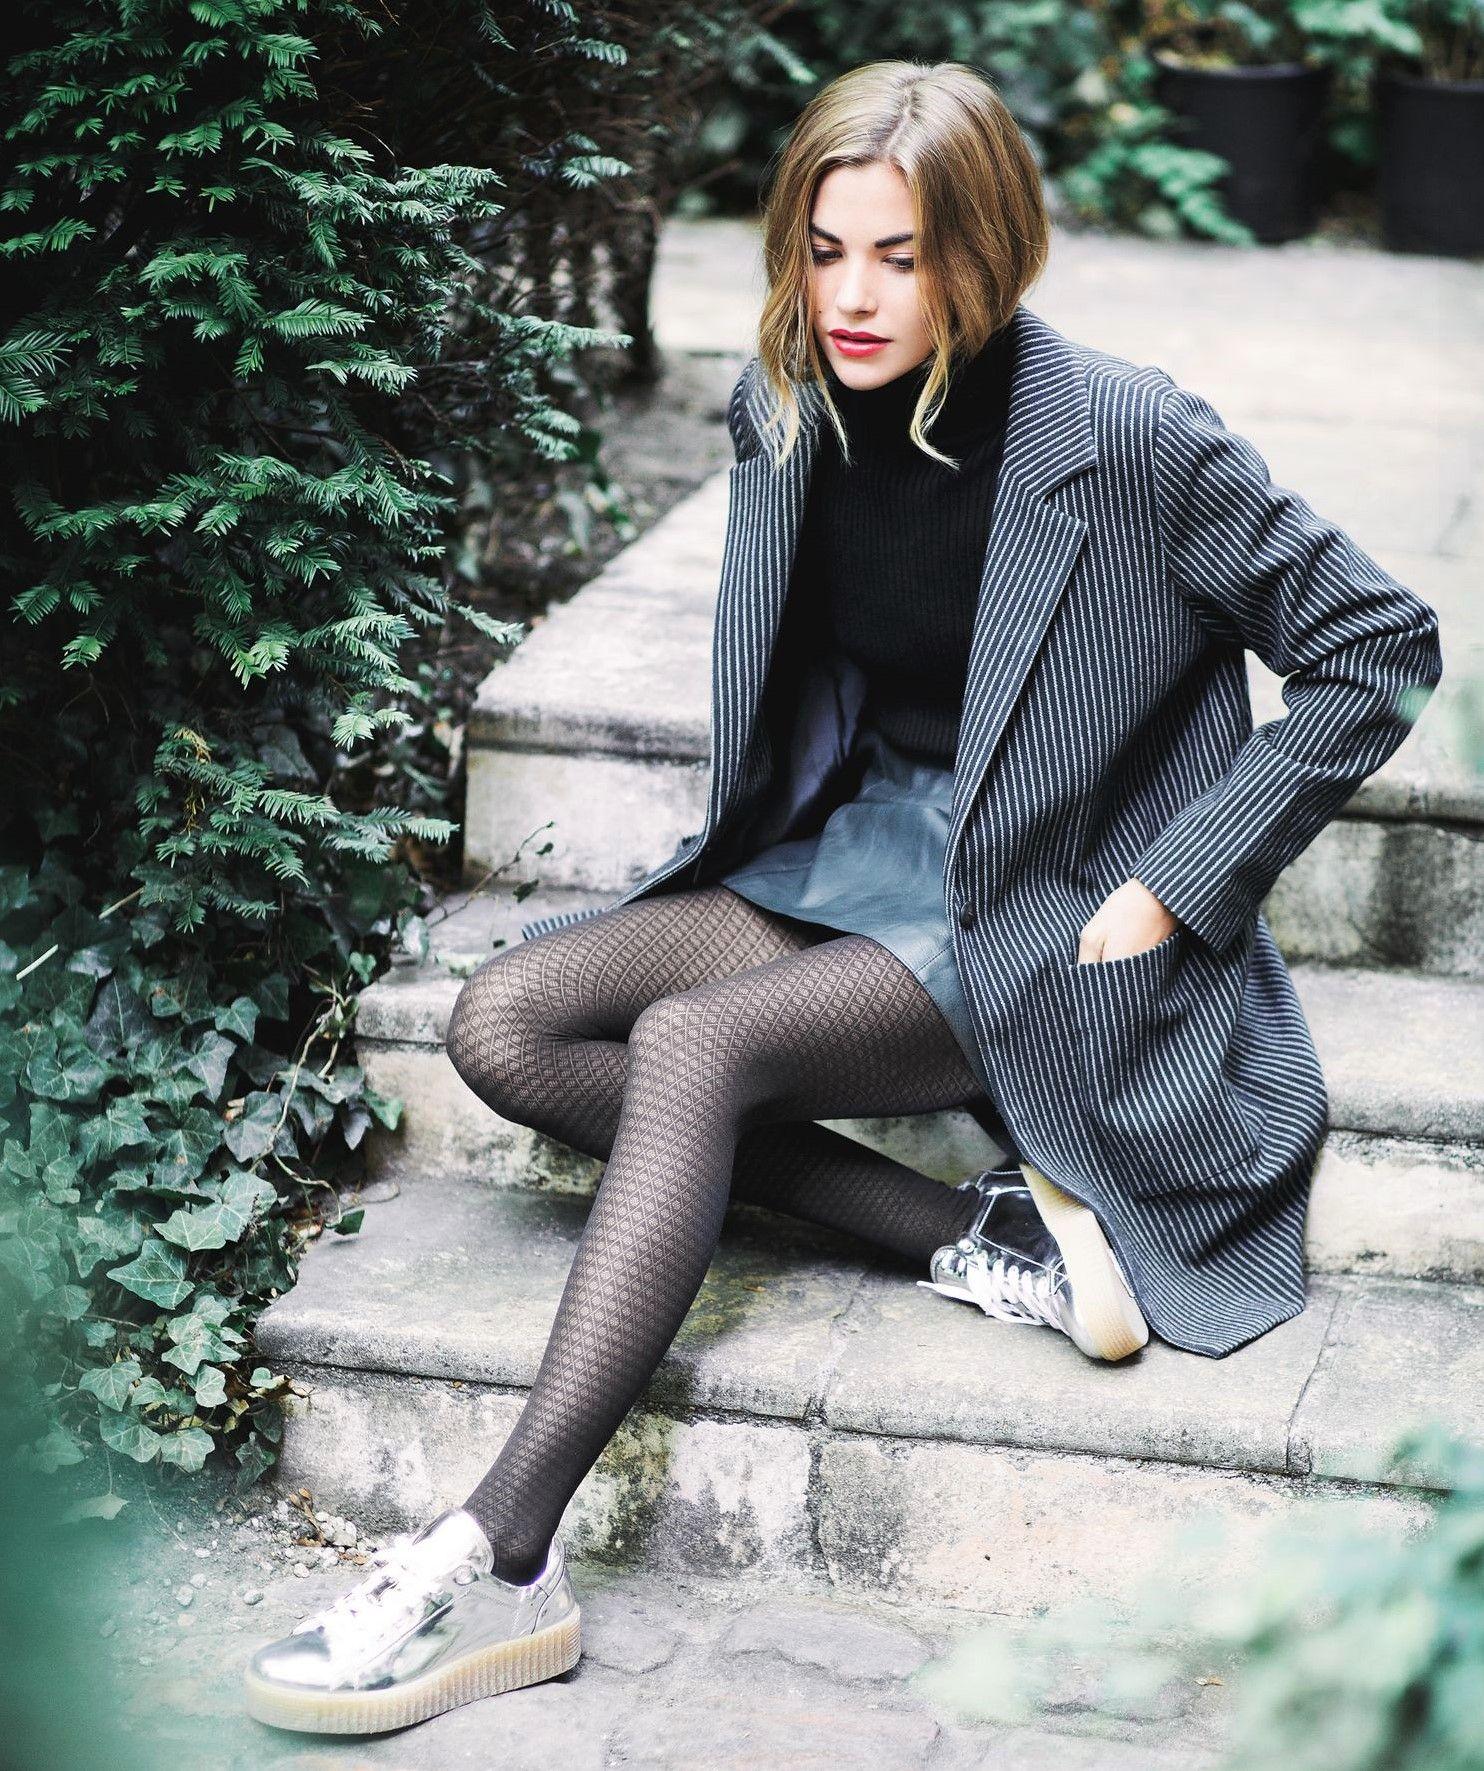 Schwarze Hot ModelWomen's Fashion Random Strumpfhosen 29WEDHI